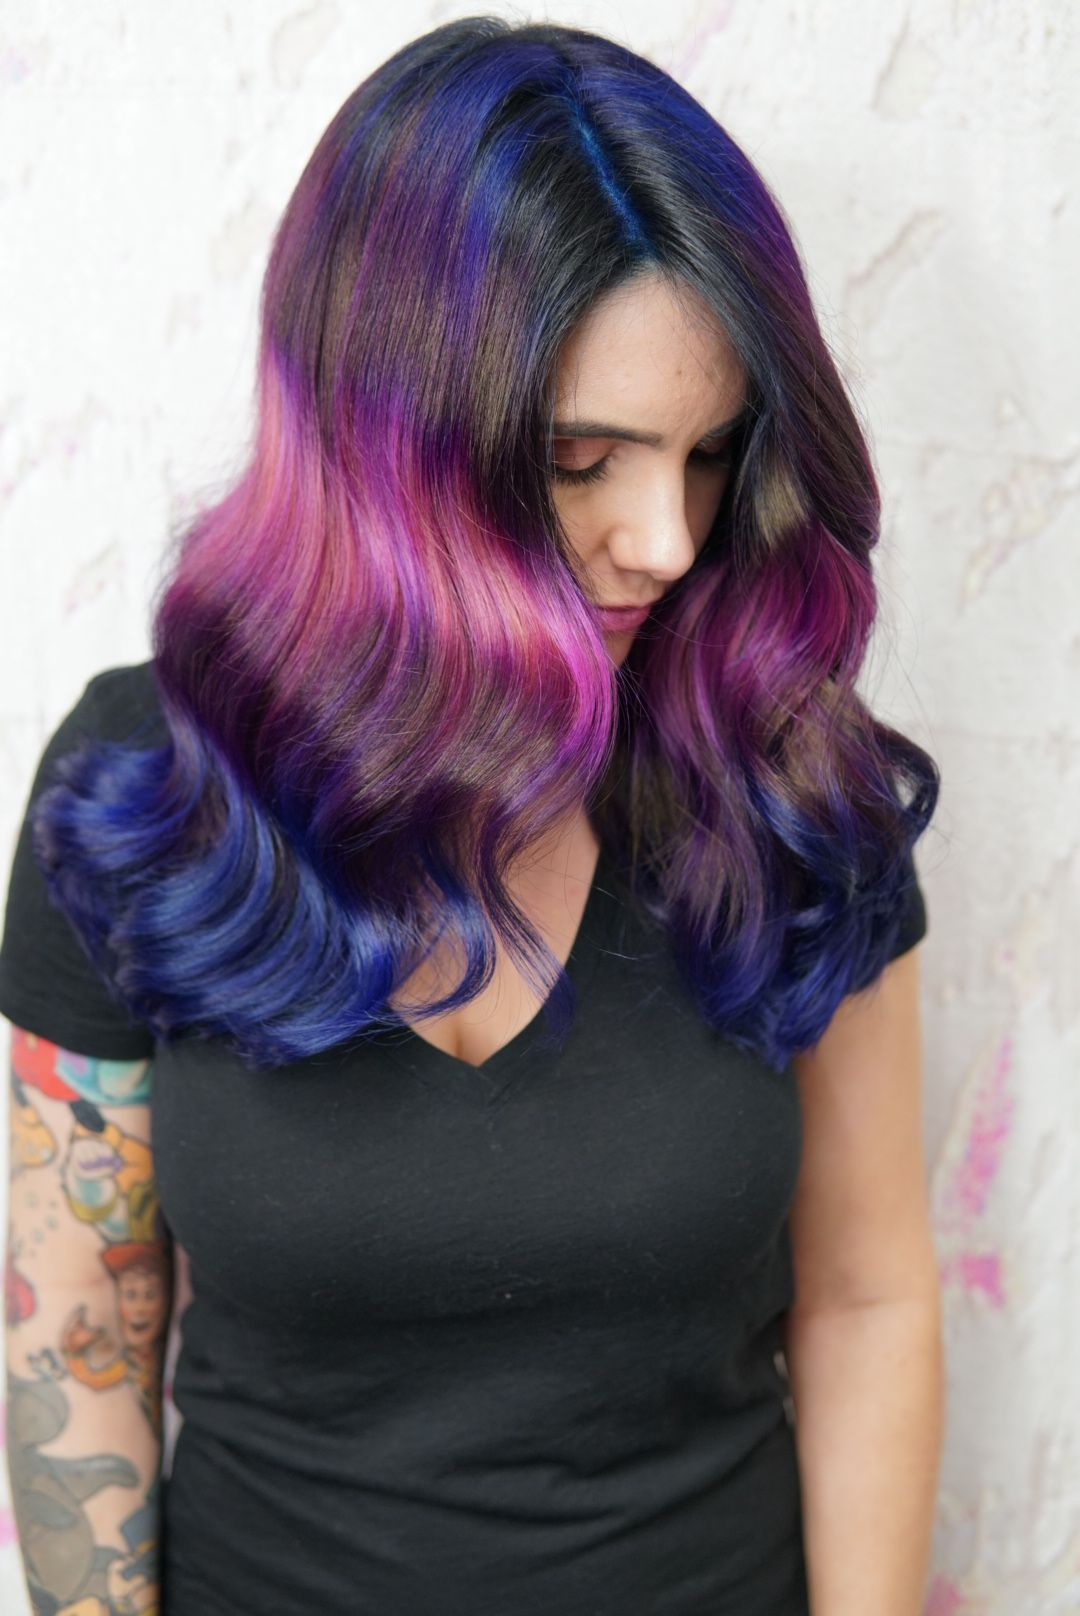 Shine Line Hair Virginiabeach Neonhair Rainbowhair Colormelt Vividhaircolor Matrix Socolorcult Vivid Hair Color Neon Hair Mermaid Hair